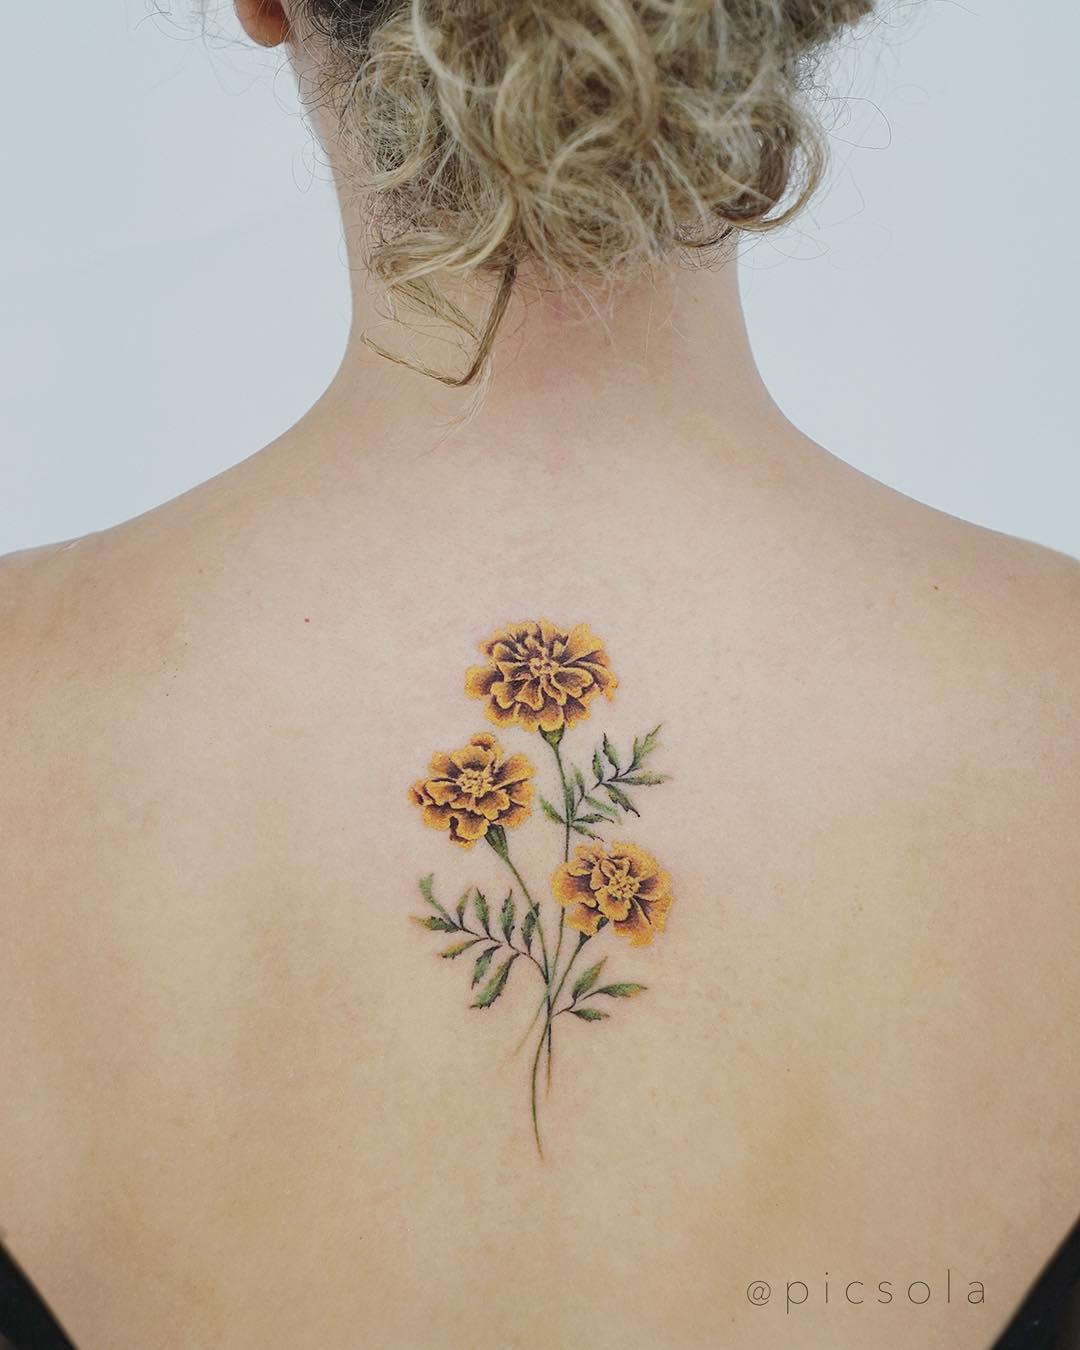 Marigold tattoo on the back by tattooist picsola